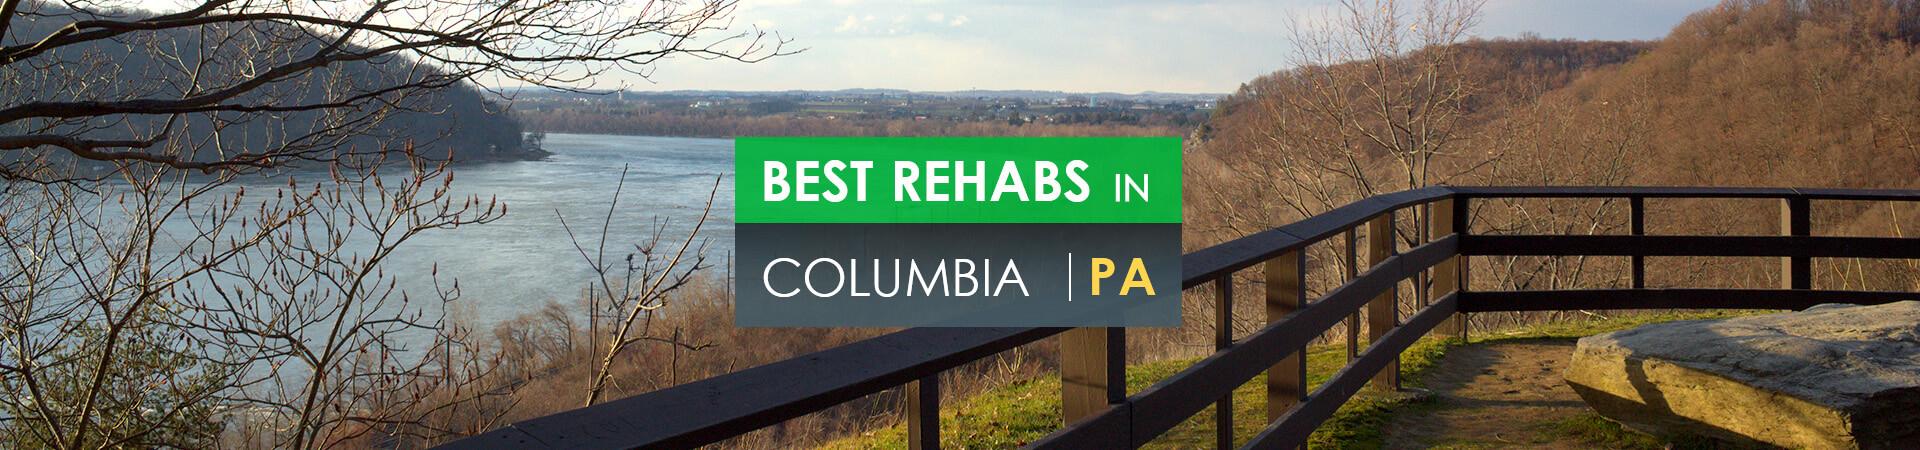 Best rehabs in Columbia, PA